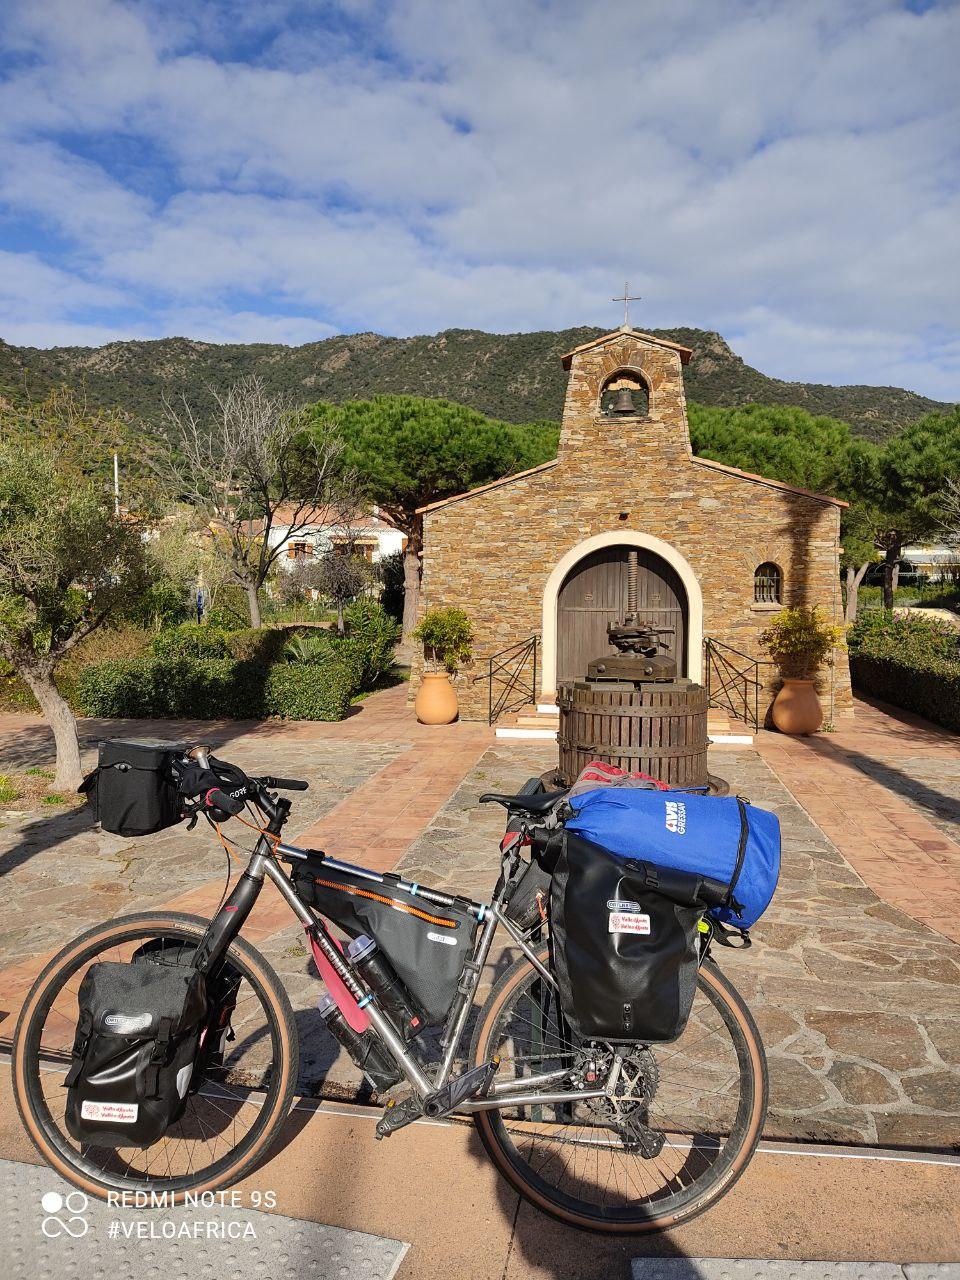 Frida un torchio vinario e una cappella medievale